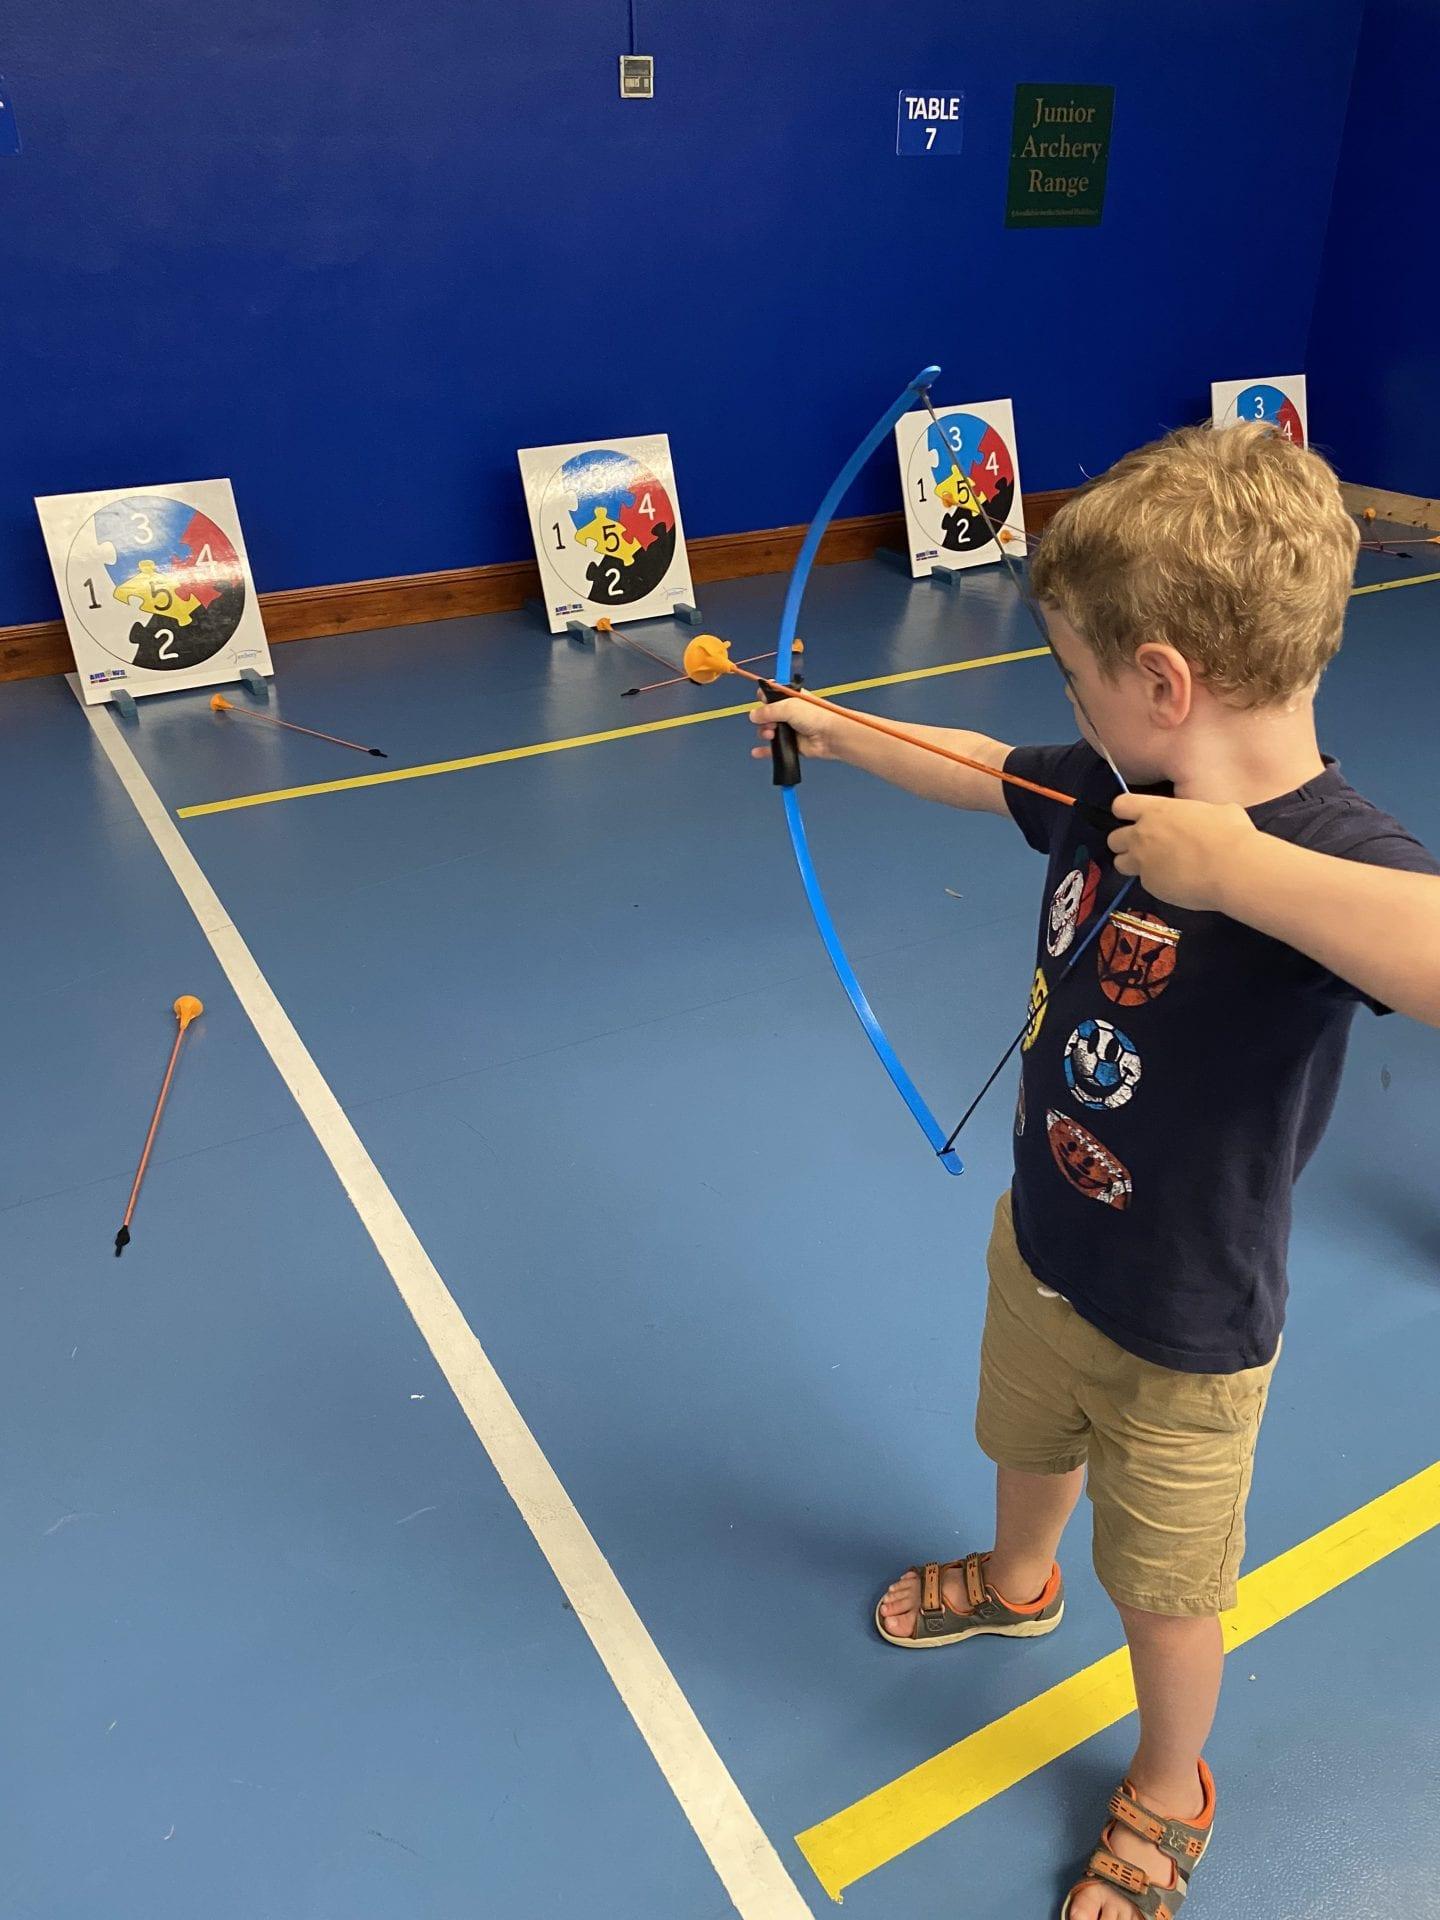 A boy doing junior archery